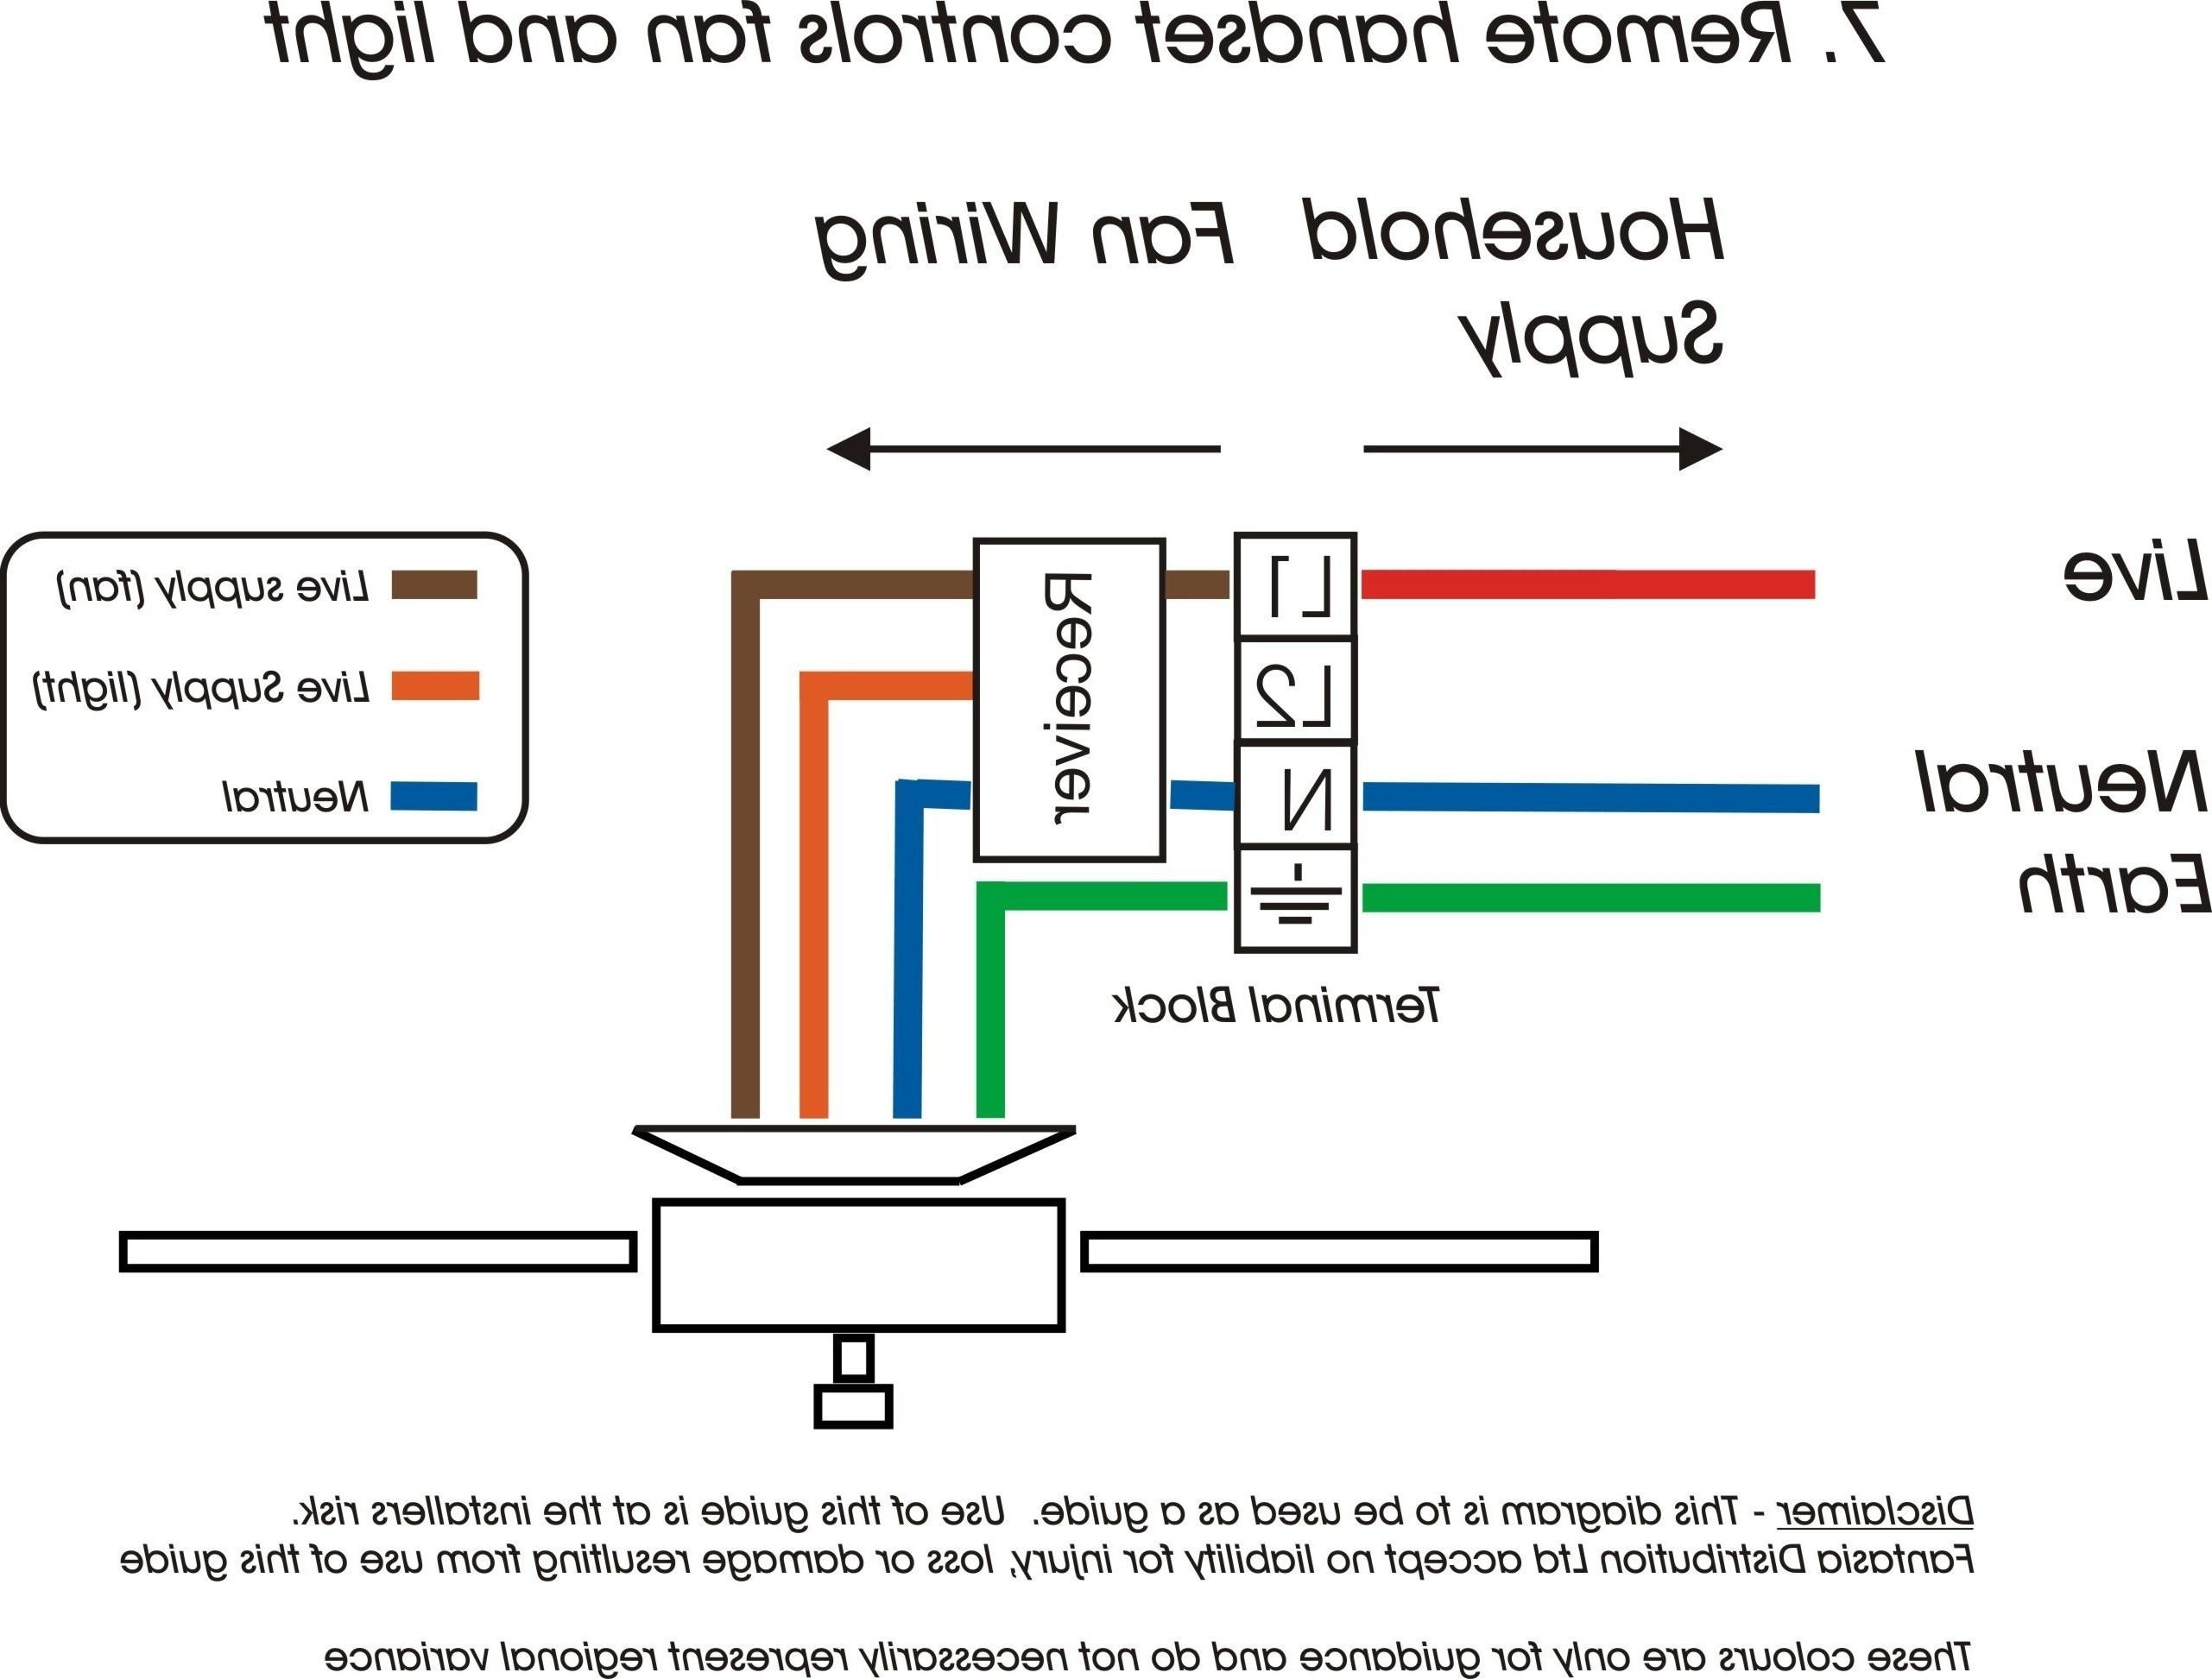 3 Phase Wiring Diagram Wiring Diagram Three Phase Generator Best 3 Phase Wiring Diagram Of 3 Phase Wiring Diagram